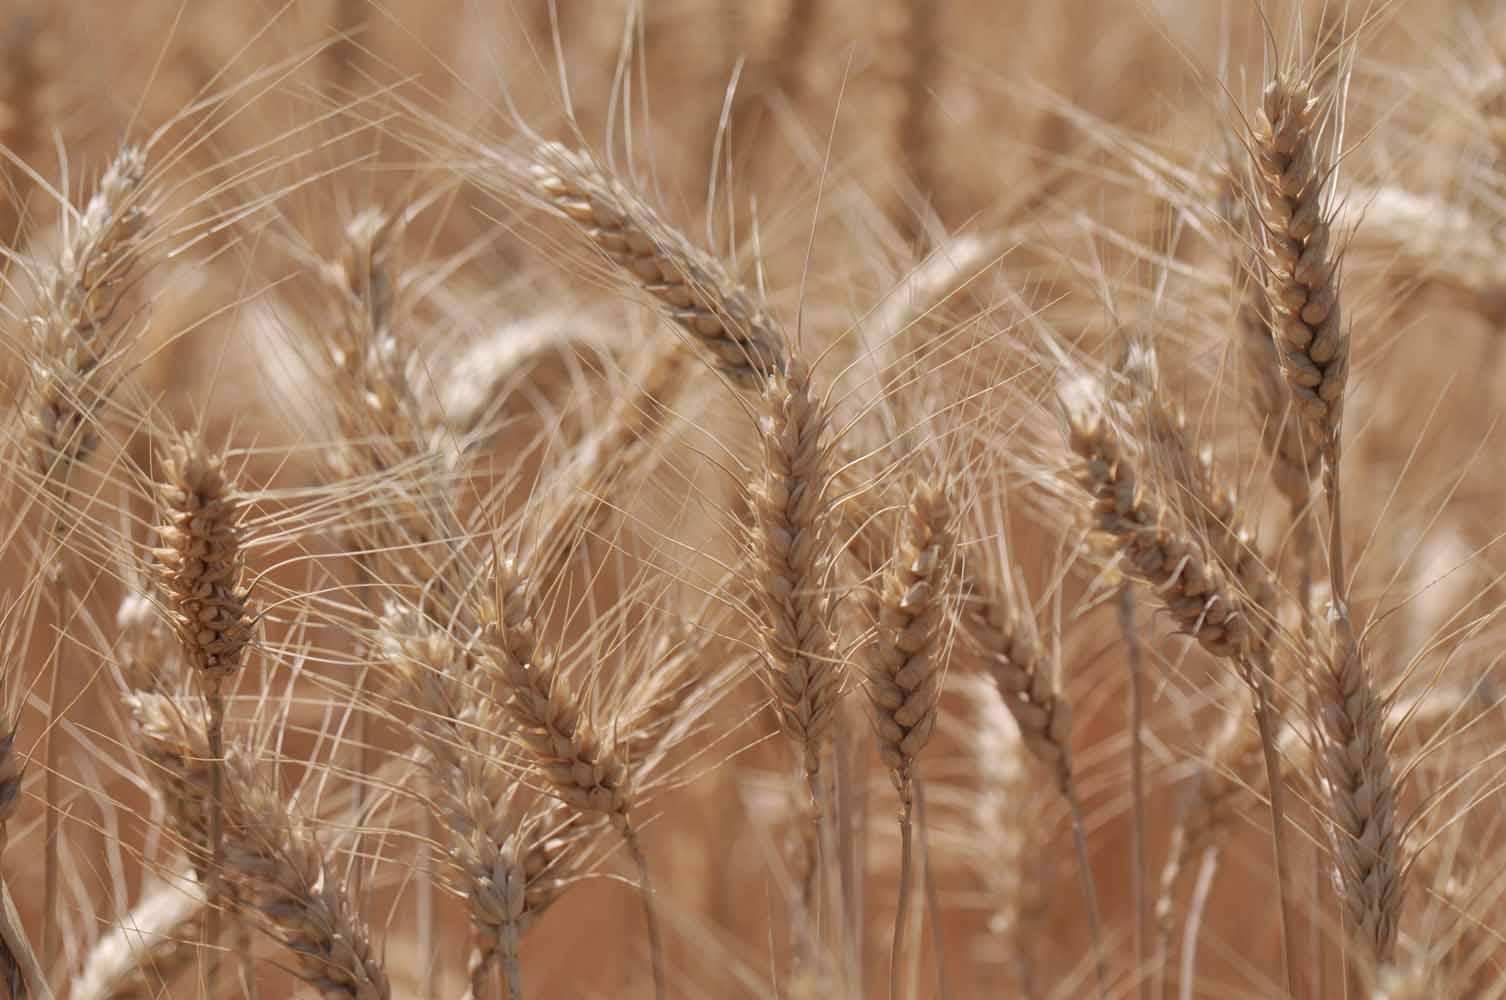 Morrow County, Wheat